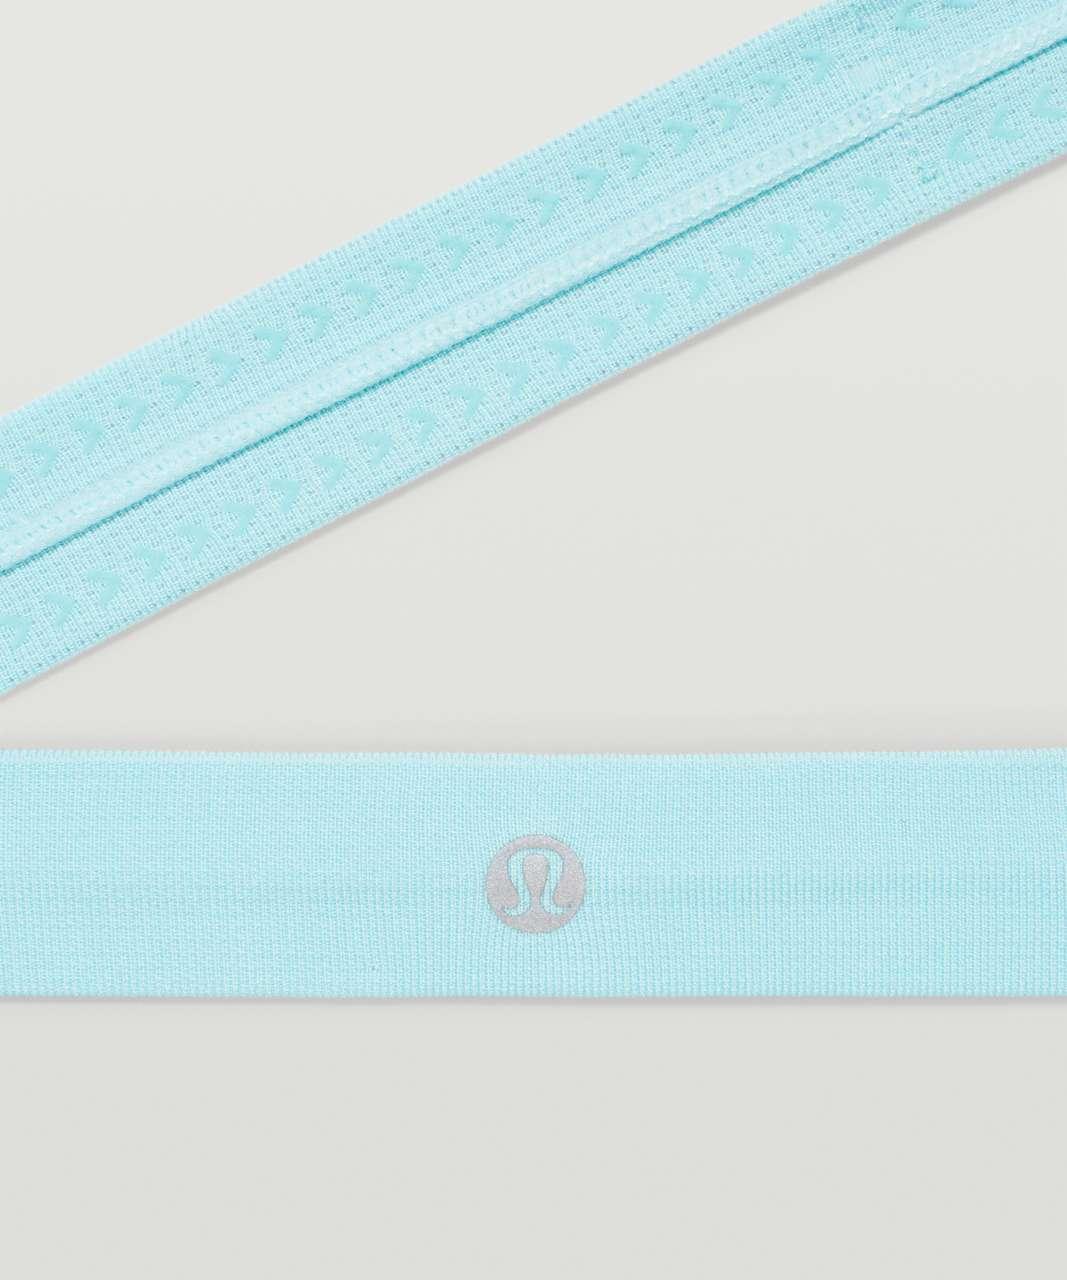 Lululemon Cardio Cross Trainer Headband - Icing Blue